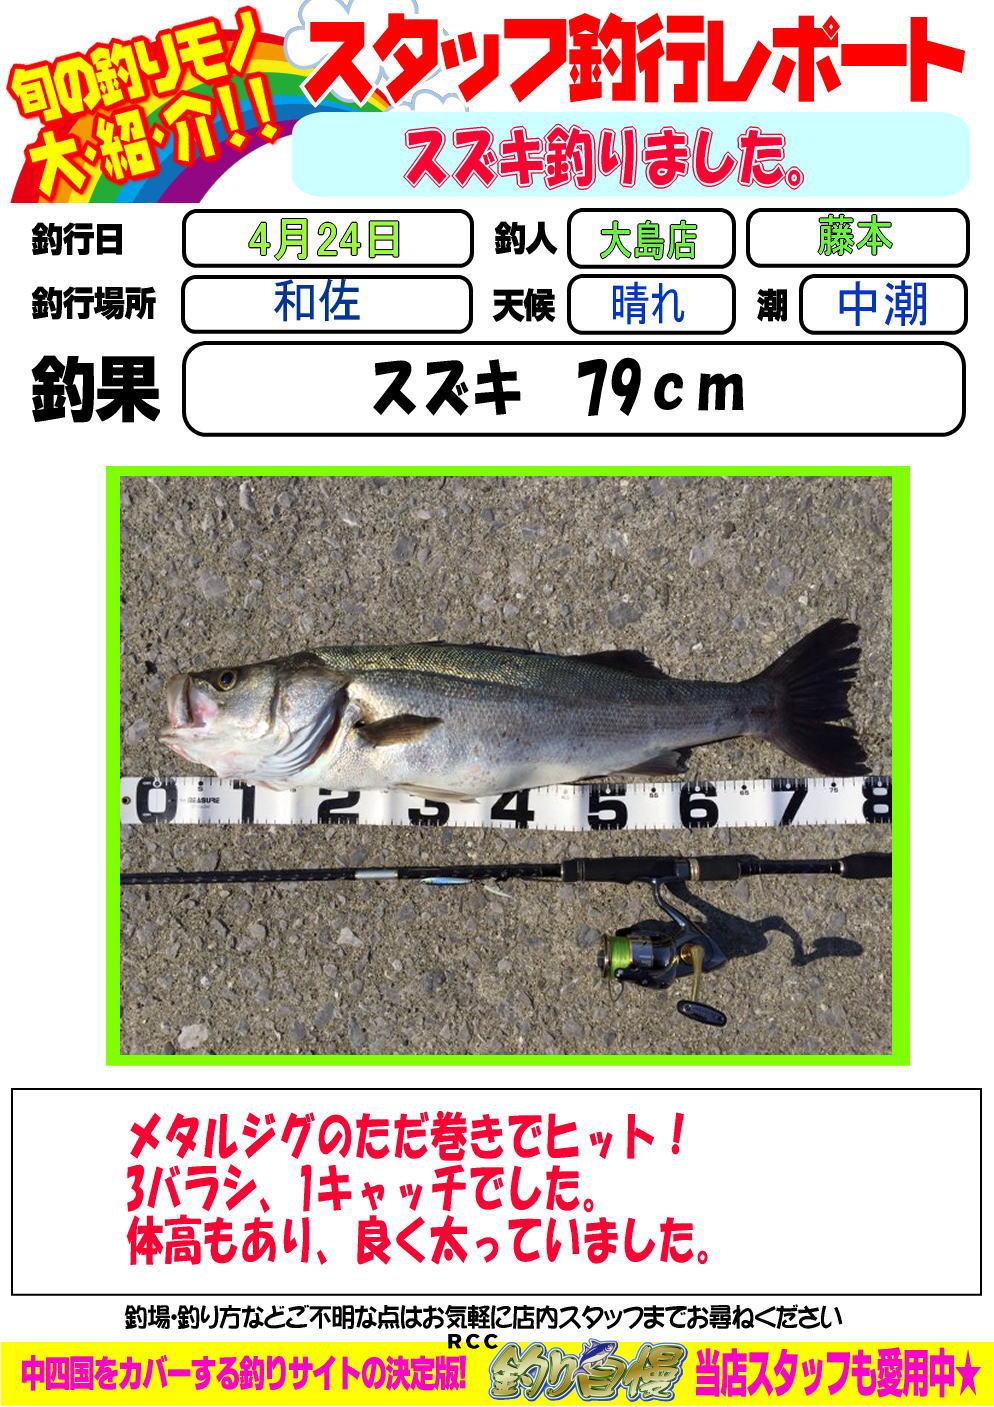 http://www.e-angle.co.jp/shop/blog/blog-20150424-ooshima-02.jpg